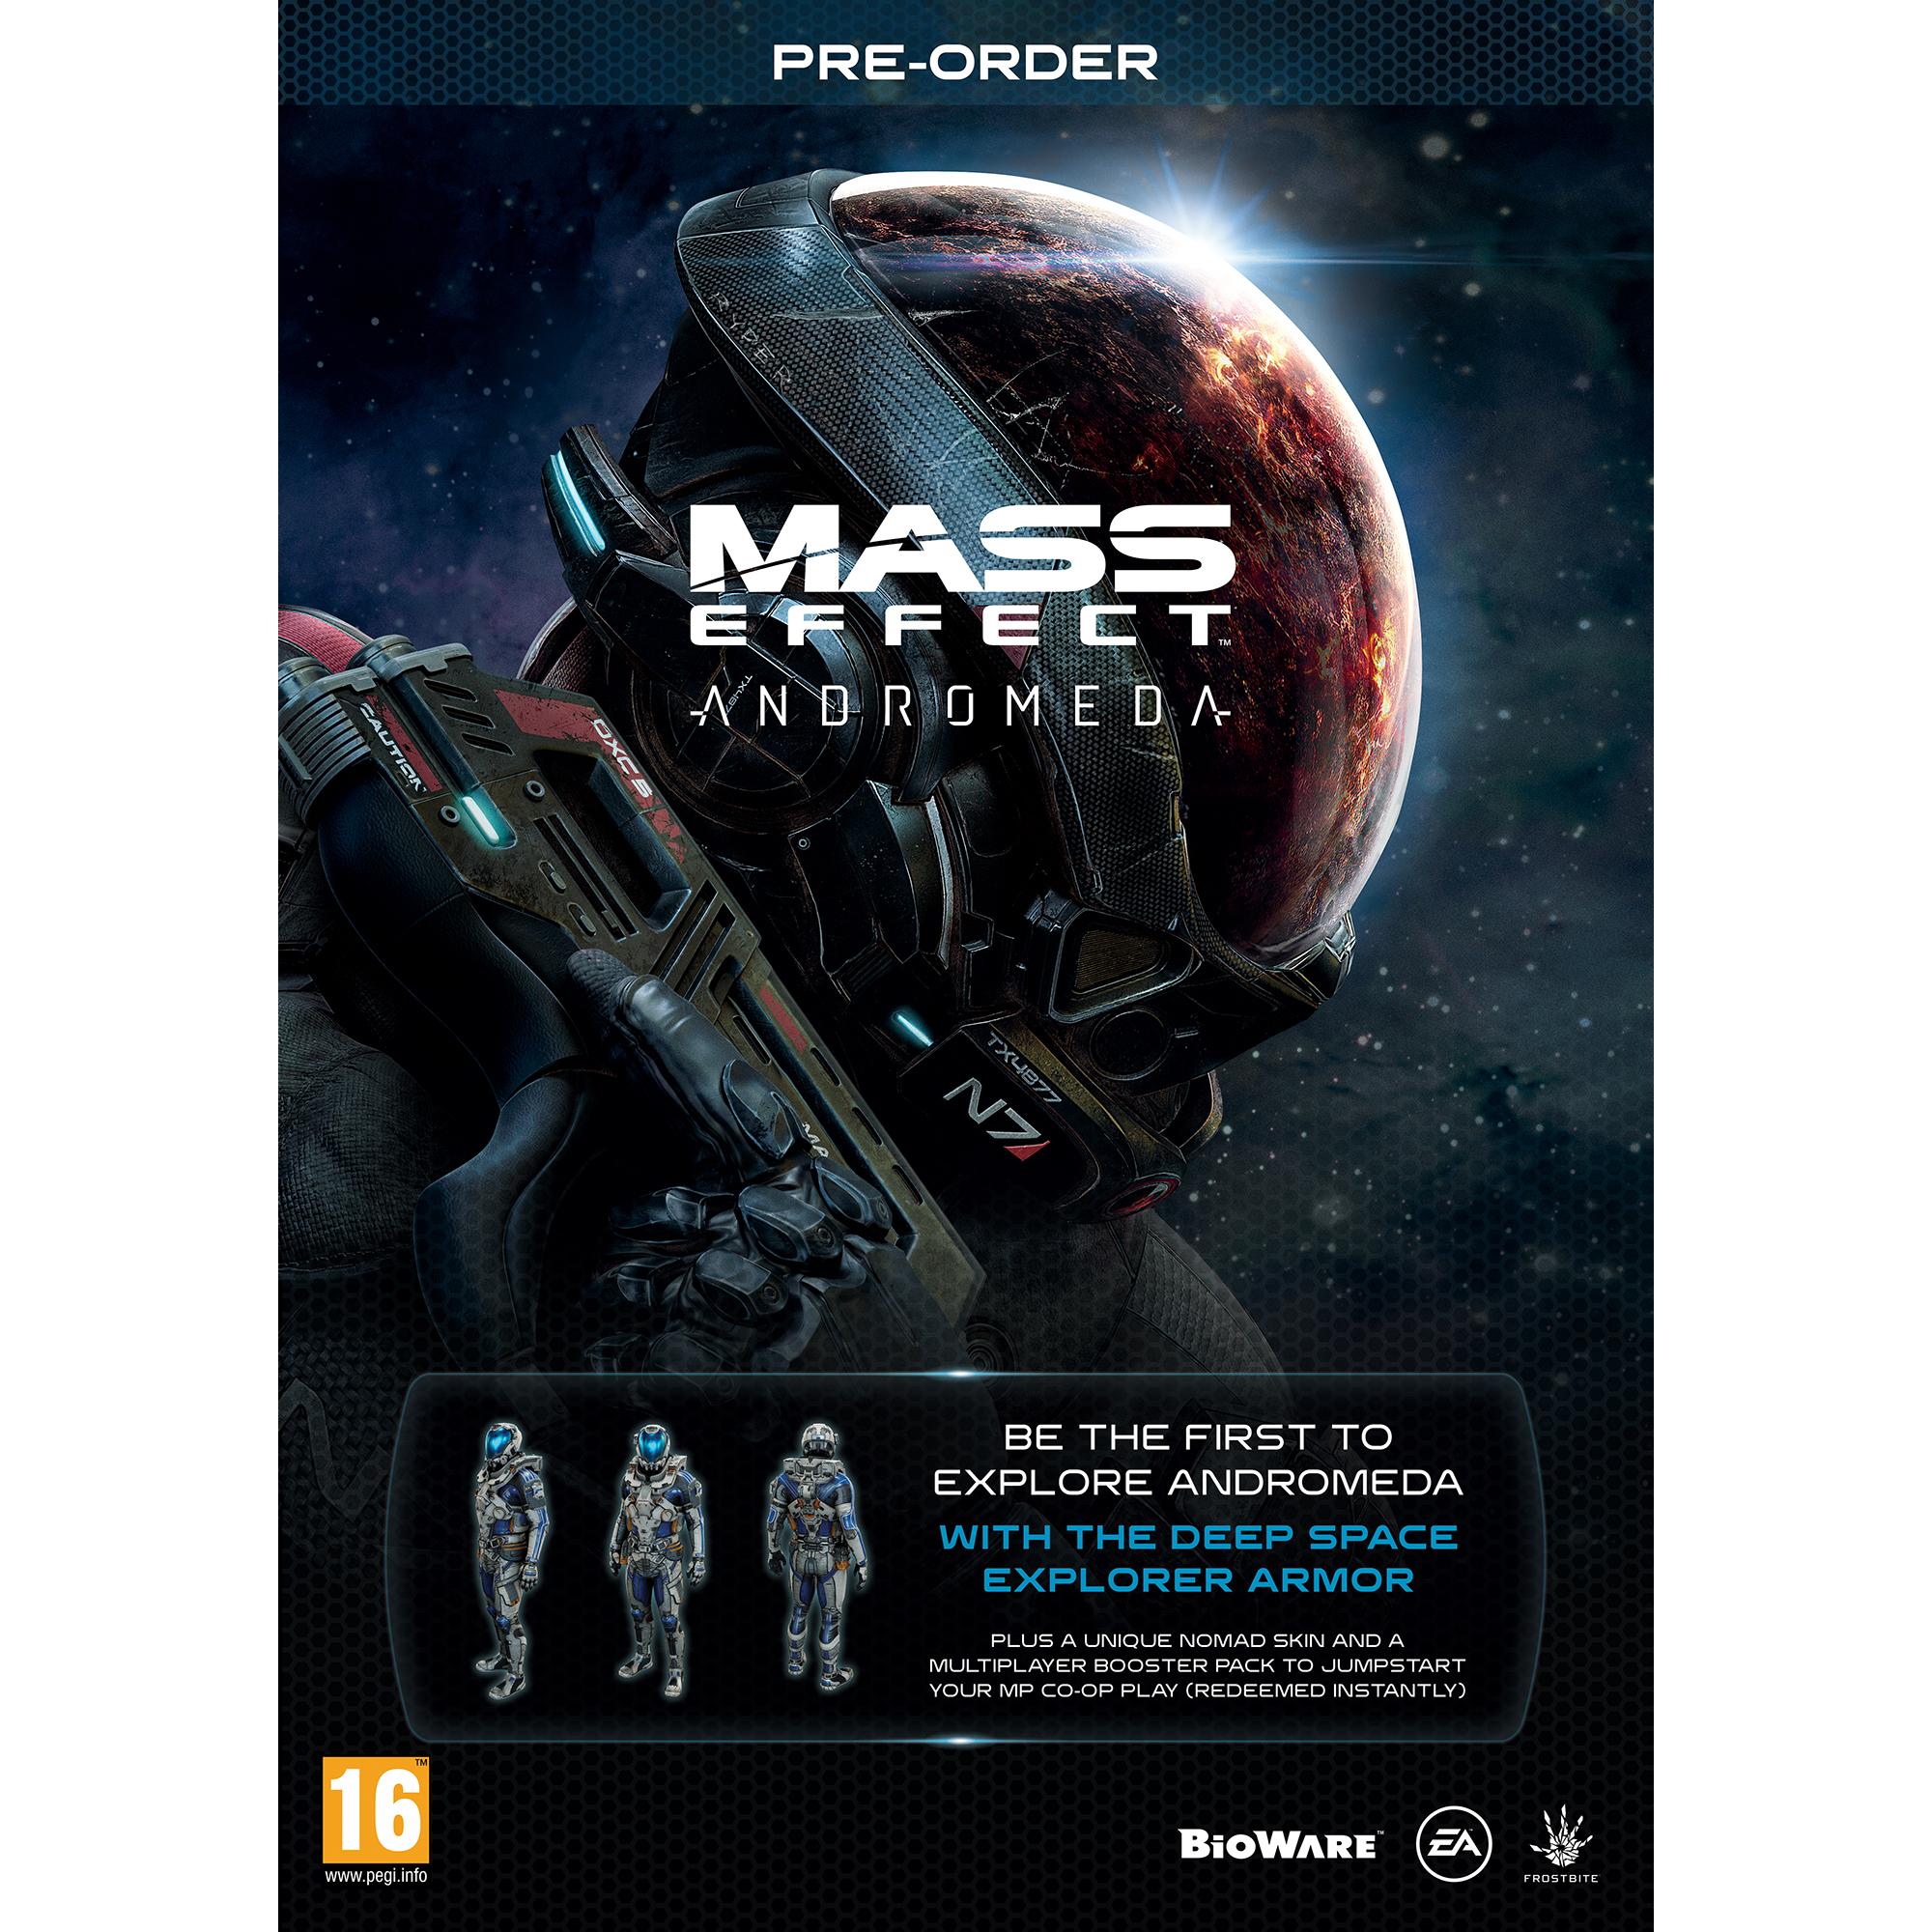 Joc Mass Effect: Andromeda pentru Xbox One 16